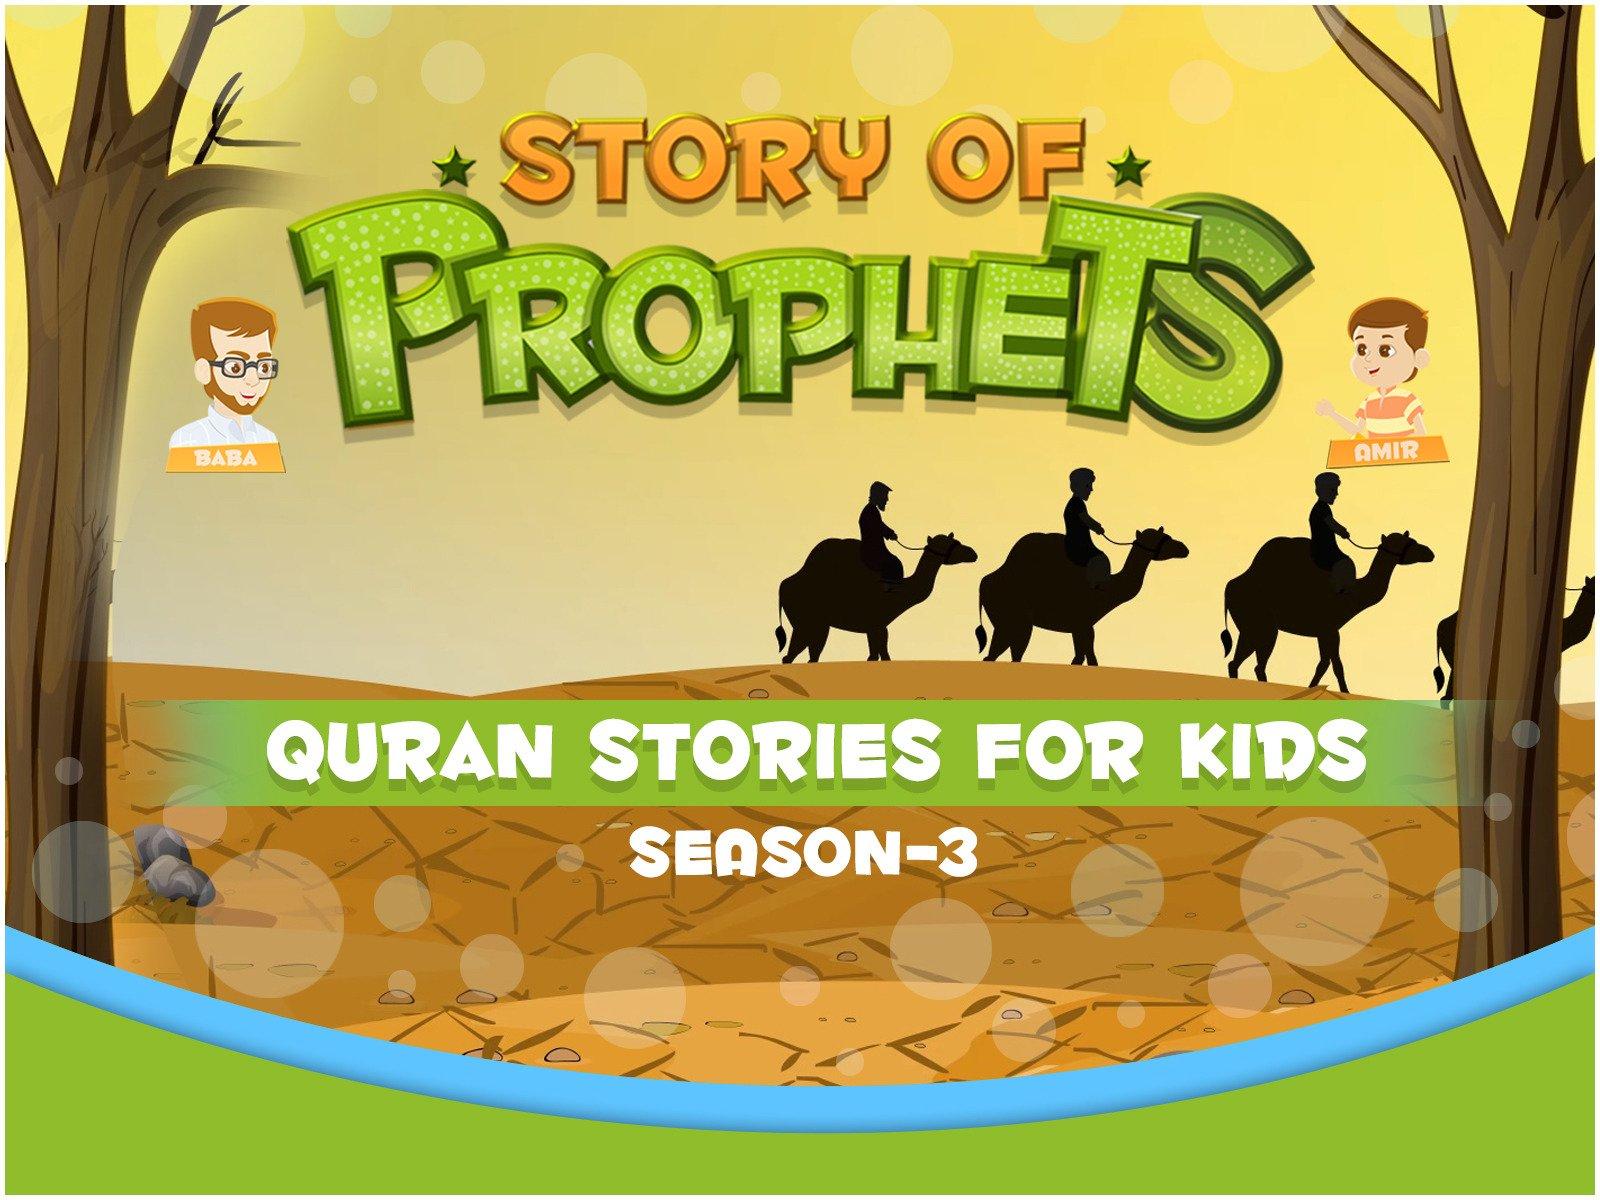 Quran Stories for Kids - Season 3